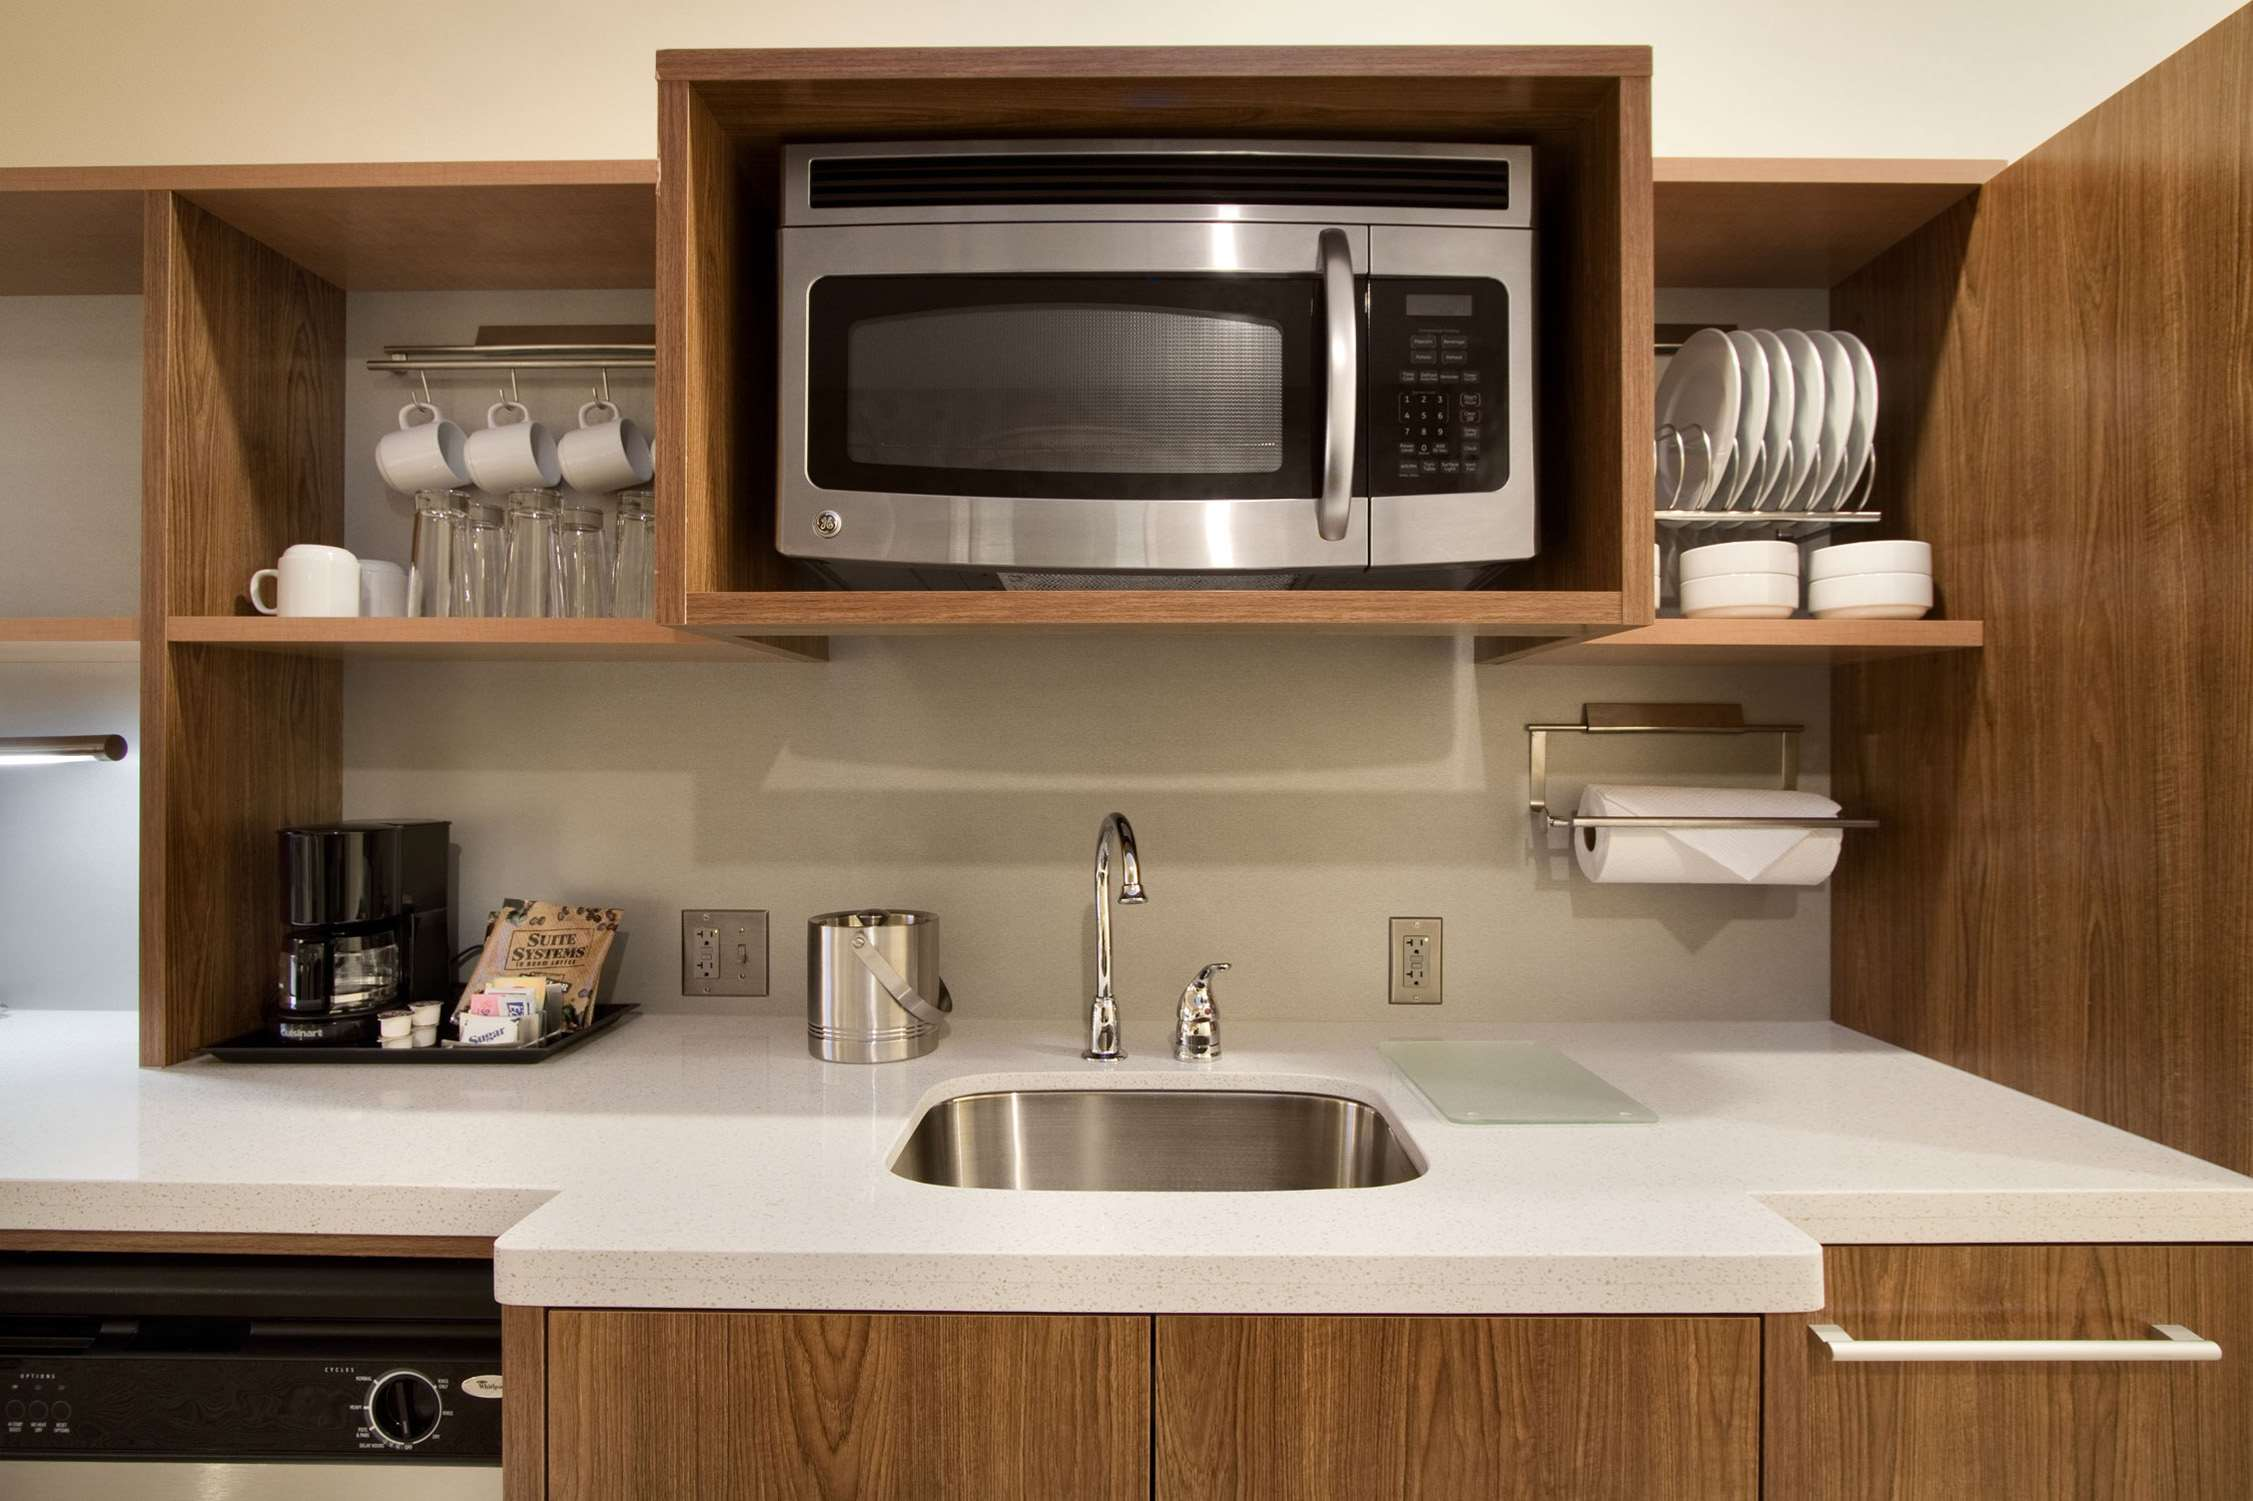 Home2 Suites by Hilton Fayetteville, NC image 3